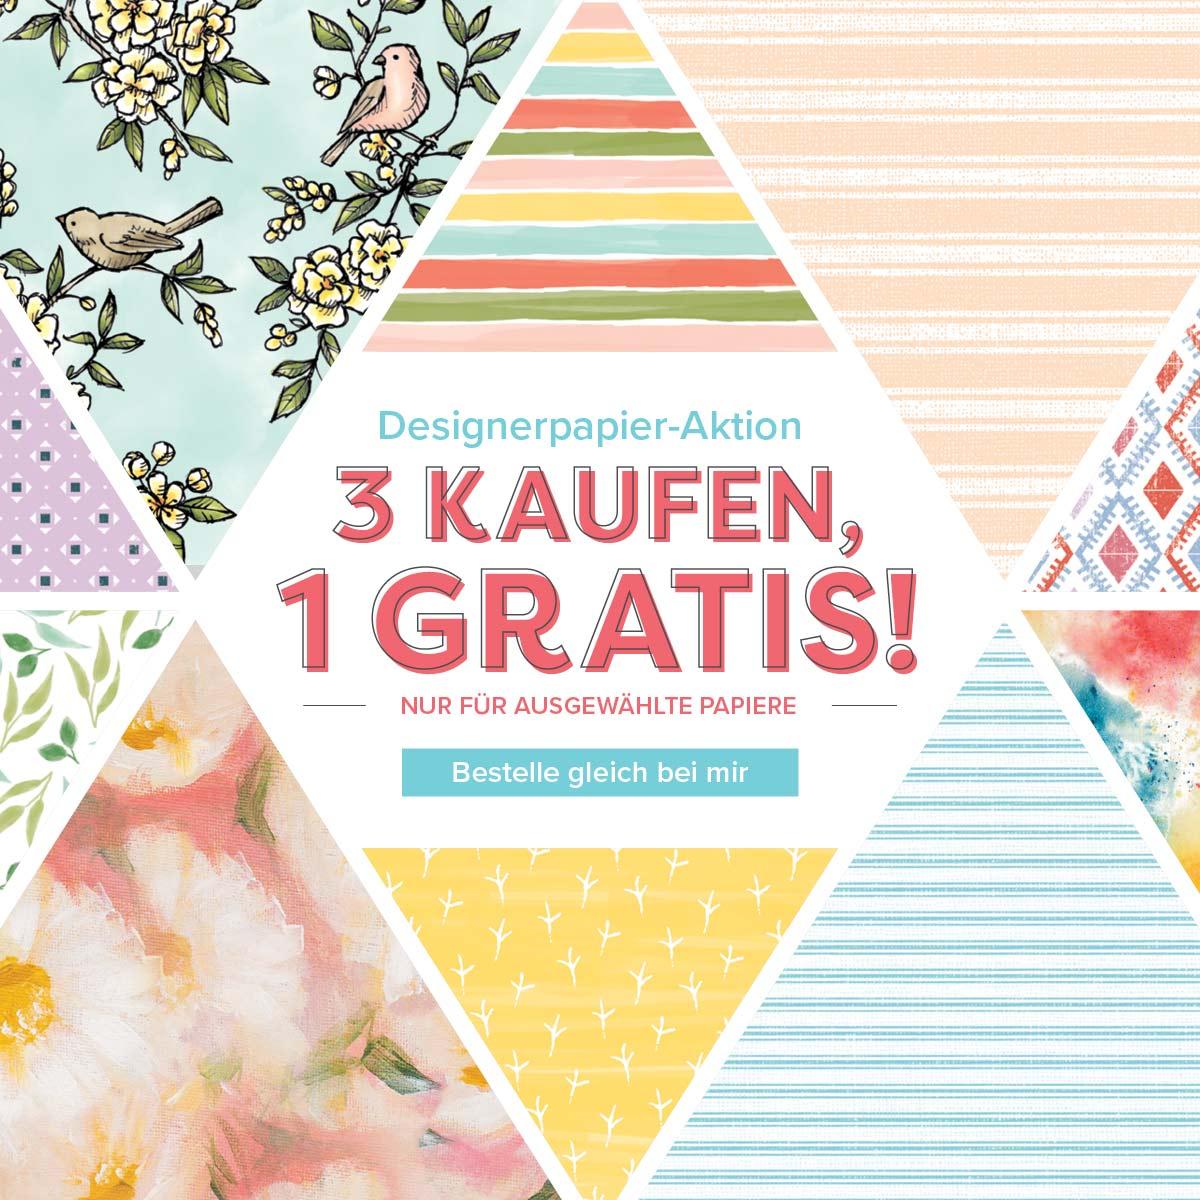 Designerpapier-Aktion vom 04.-30.09.2019